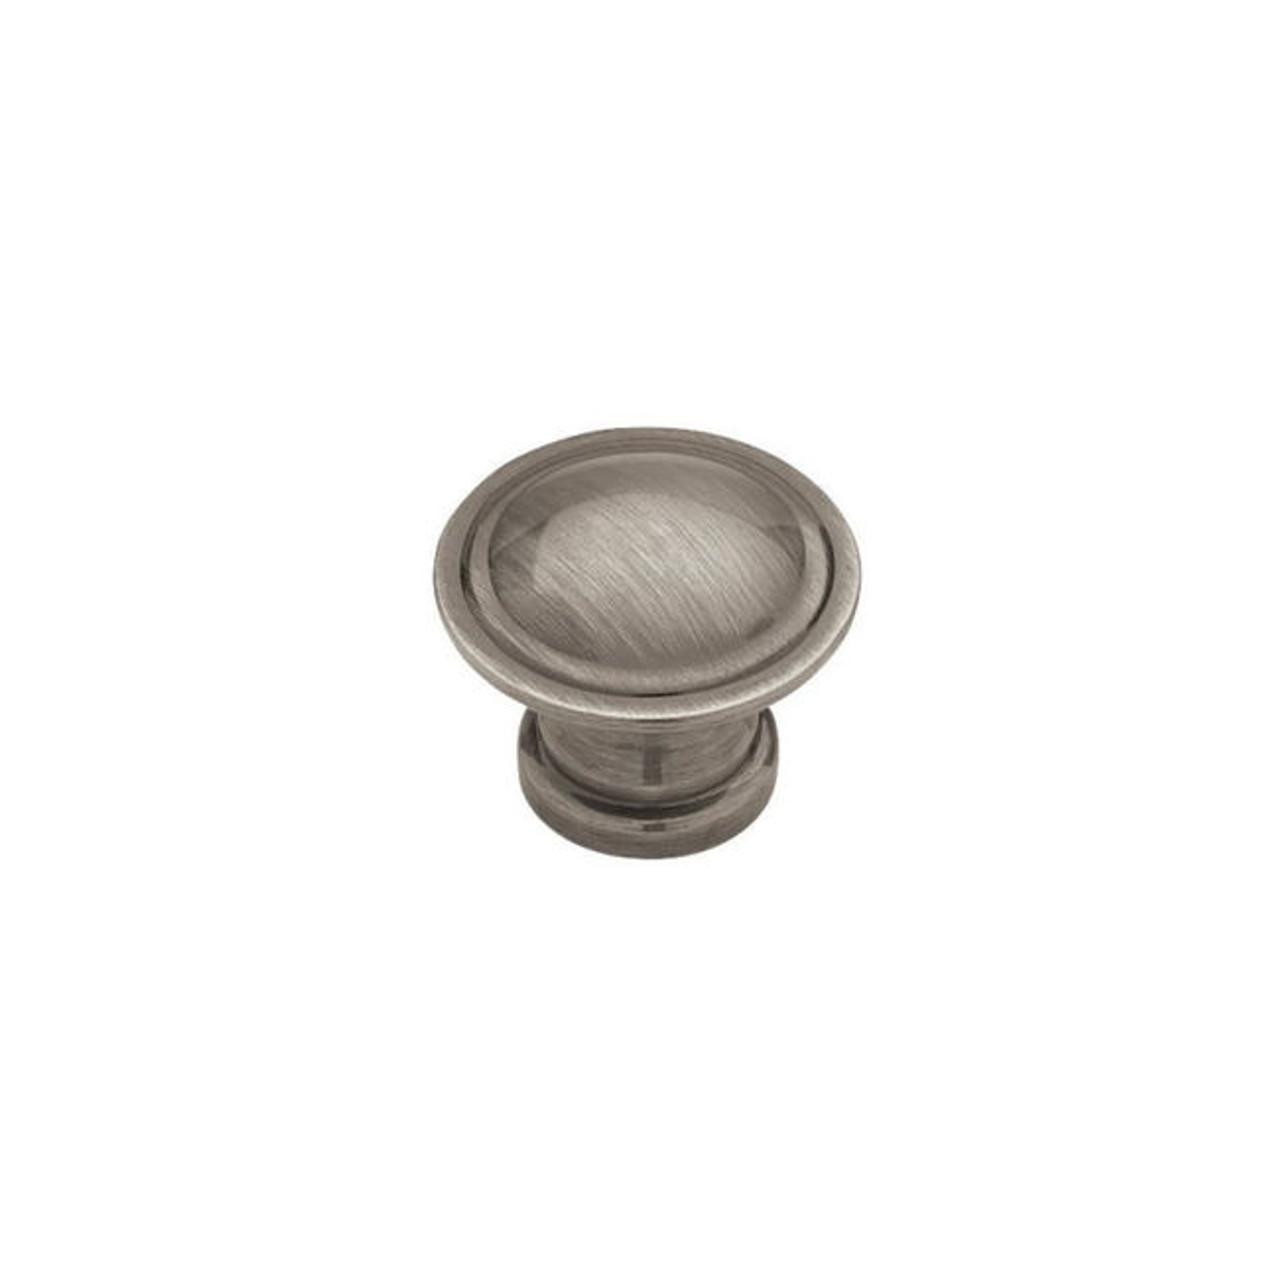 "PN0408C-BNP Brushed Nickel 1 1/8""  Cabinet Drawer Knob"